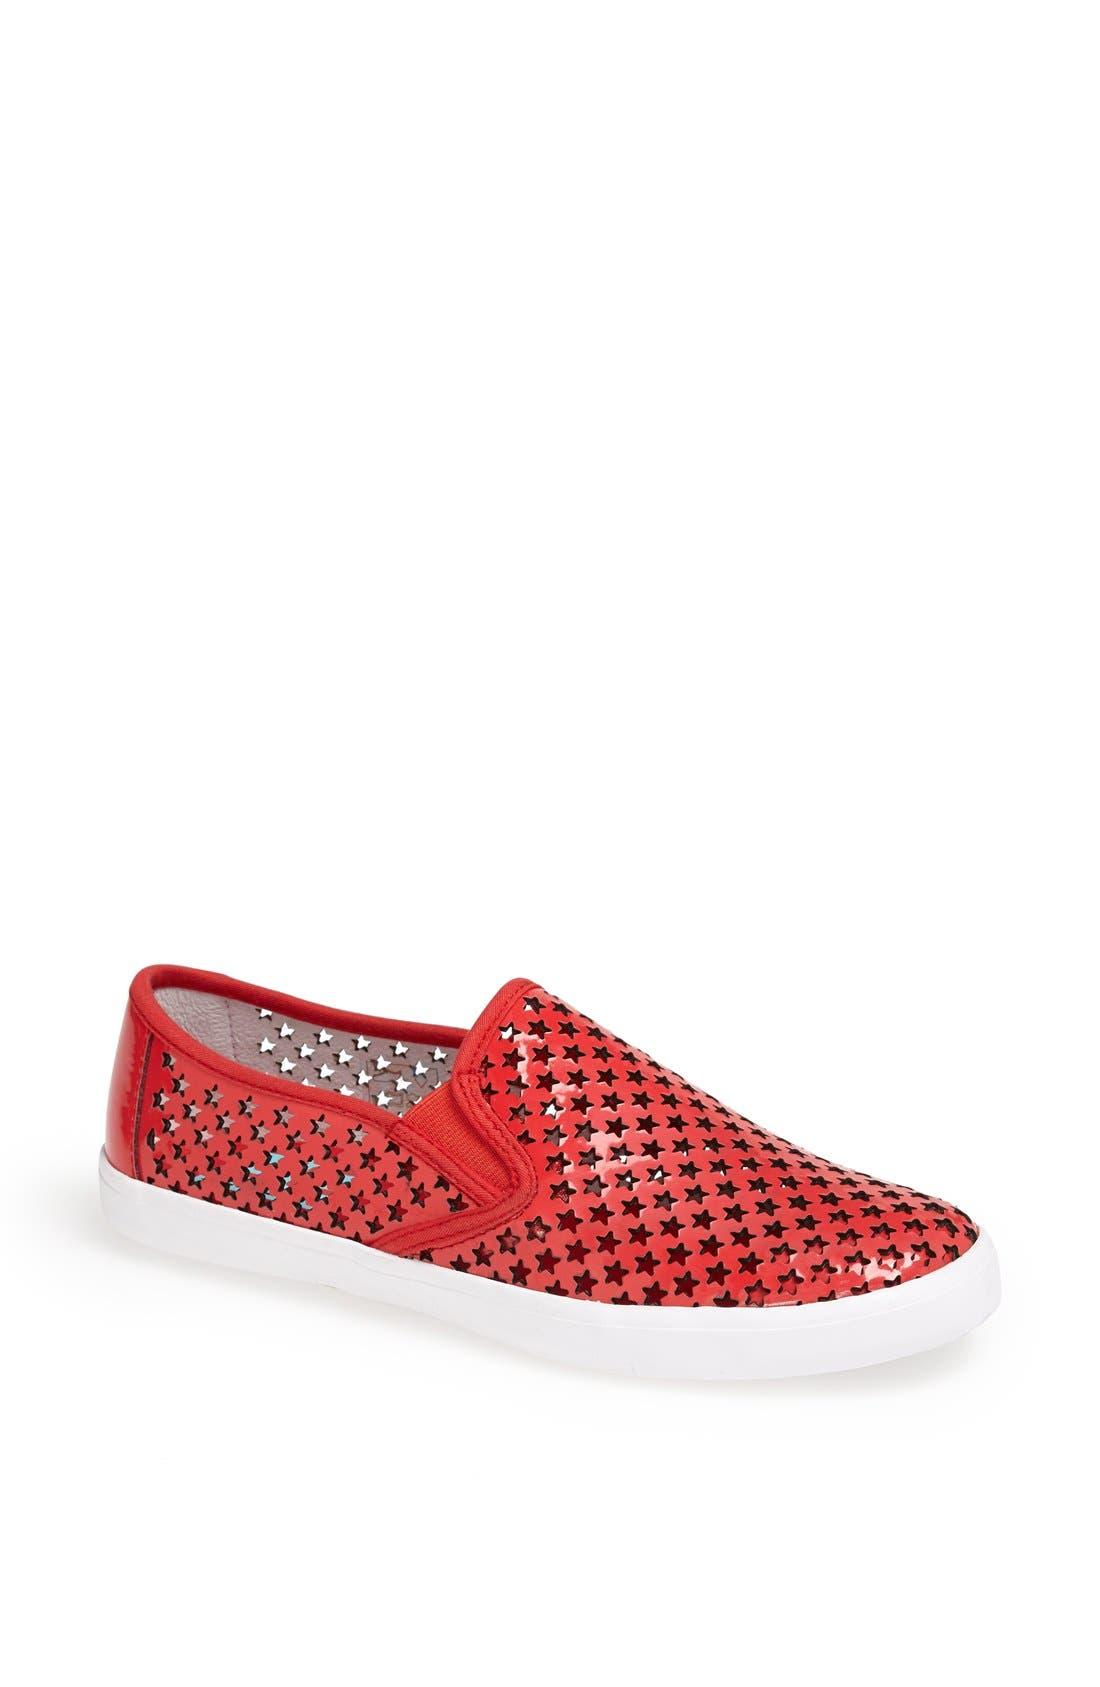 Main Image - Jeffrey Campbell 'Dougray' Patent Cutout Slip-On Sneaker